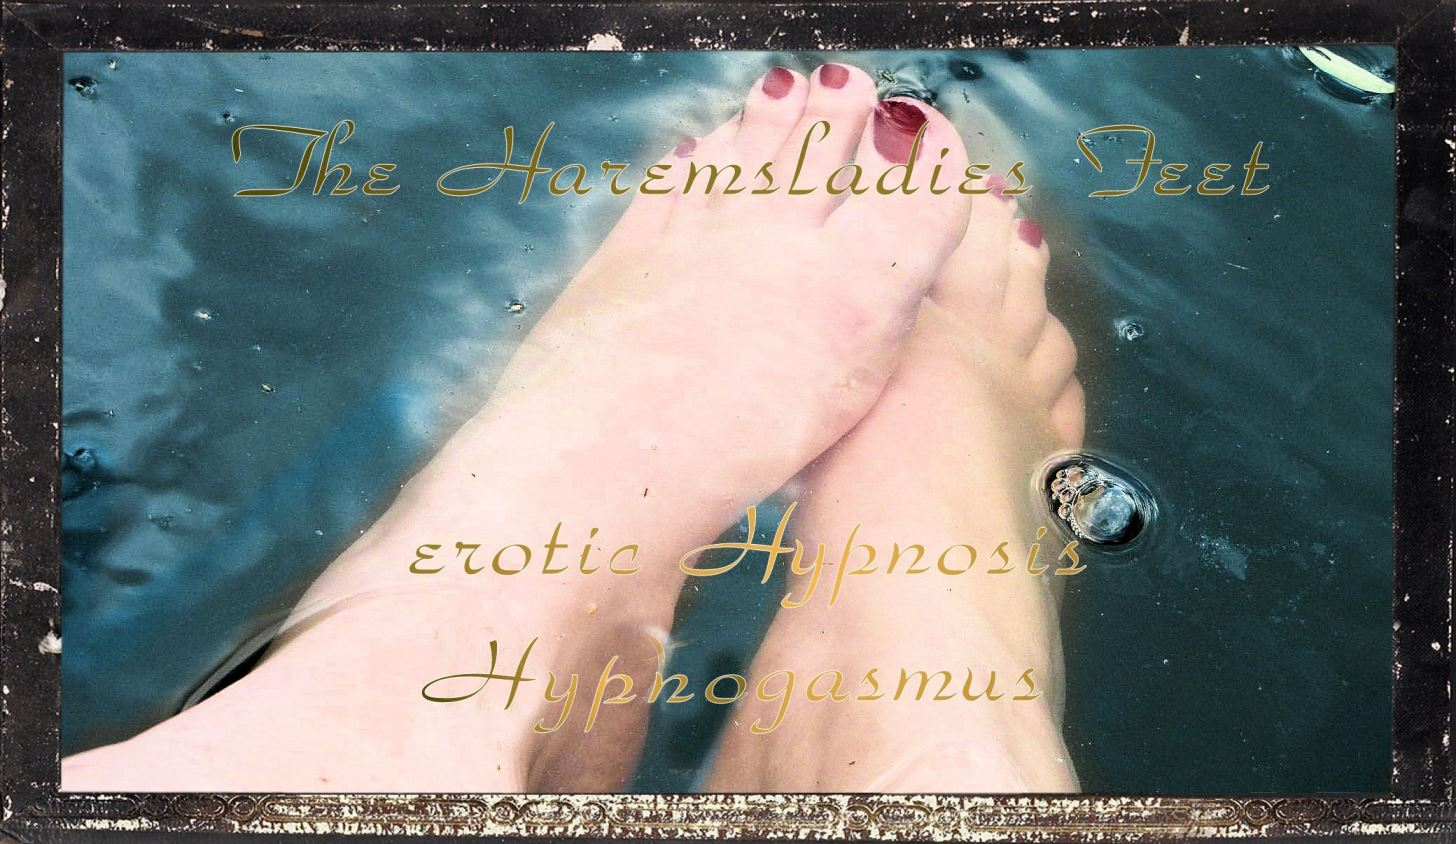 The Haremsladies Feet